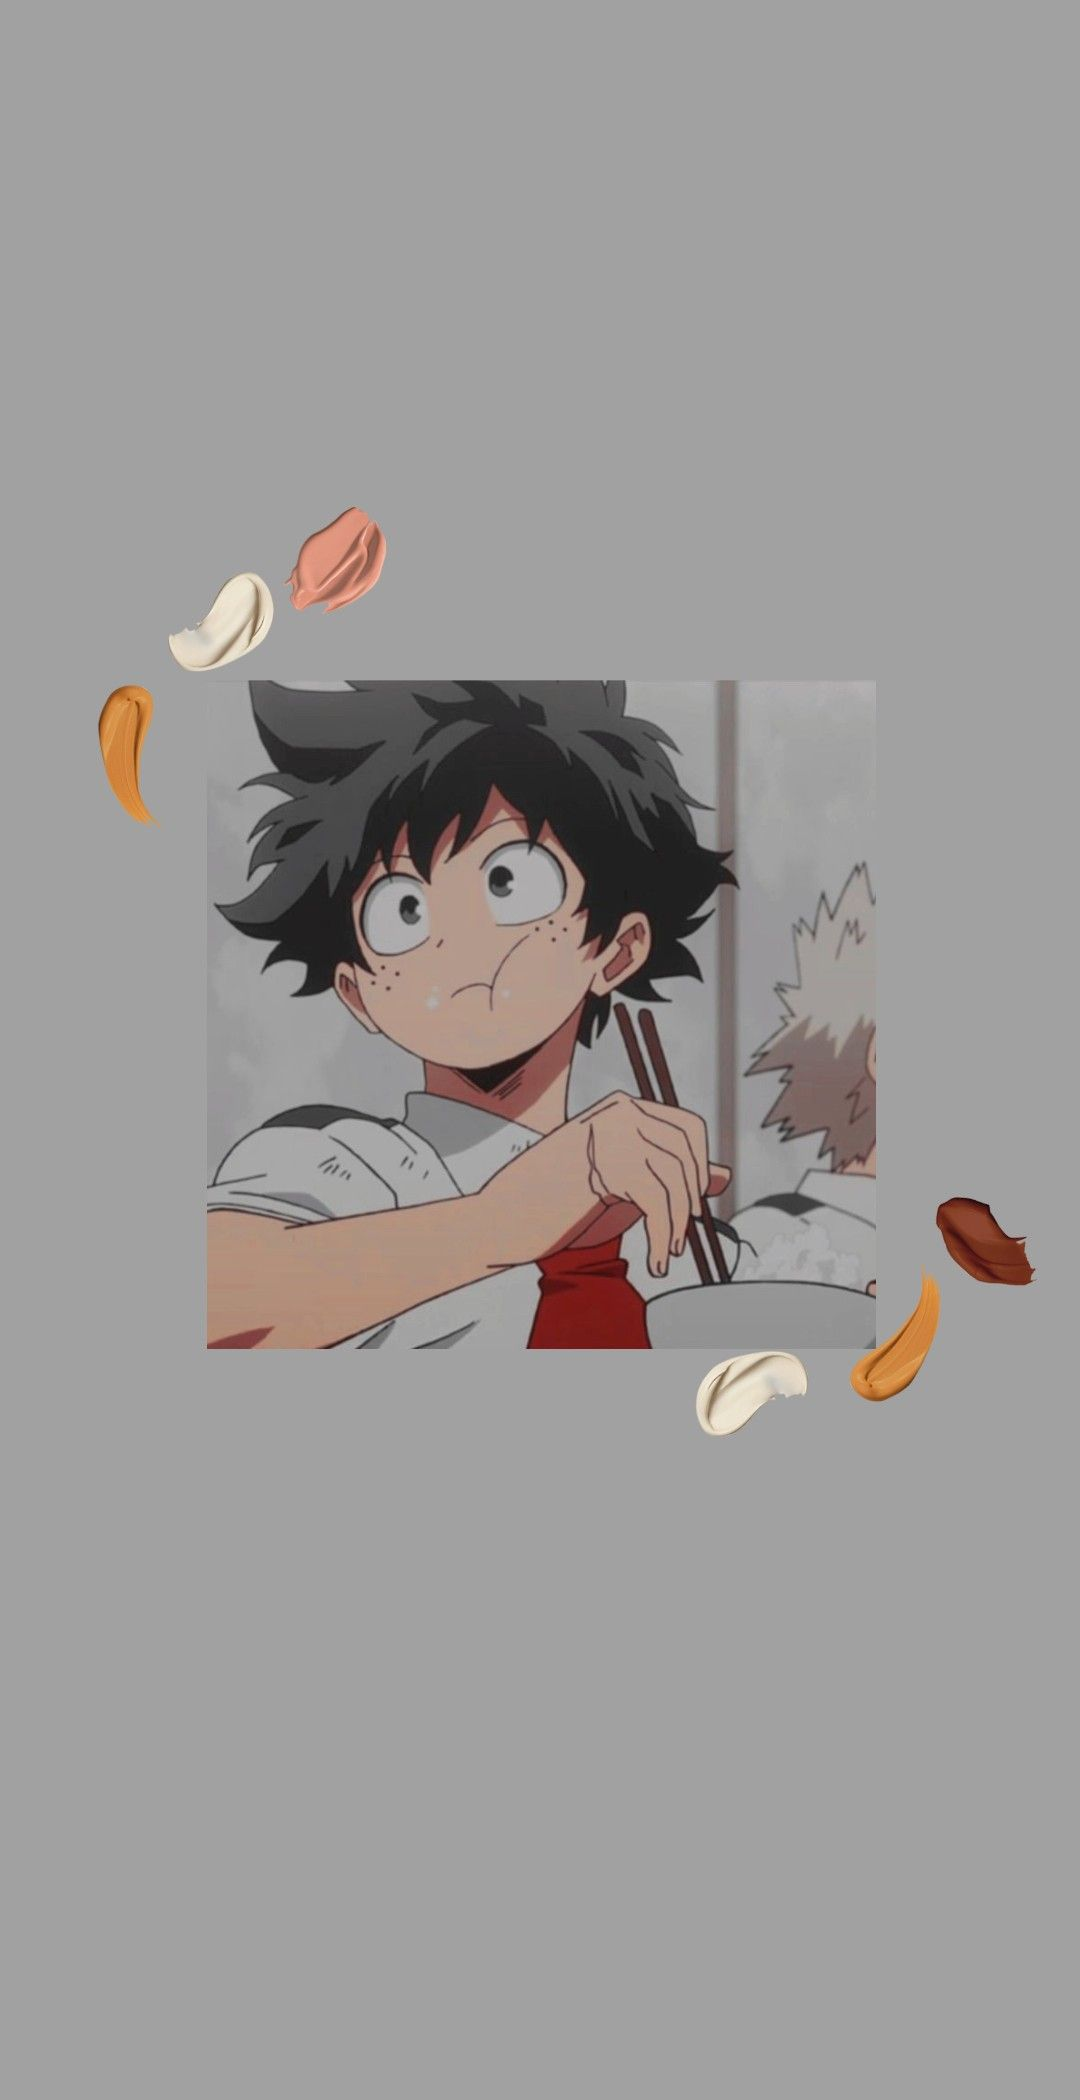 Deku Aesthetic Wallpaper Cute Anime Wallpaper Anime Wallpaper Hero Wallpaper